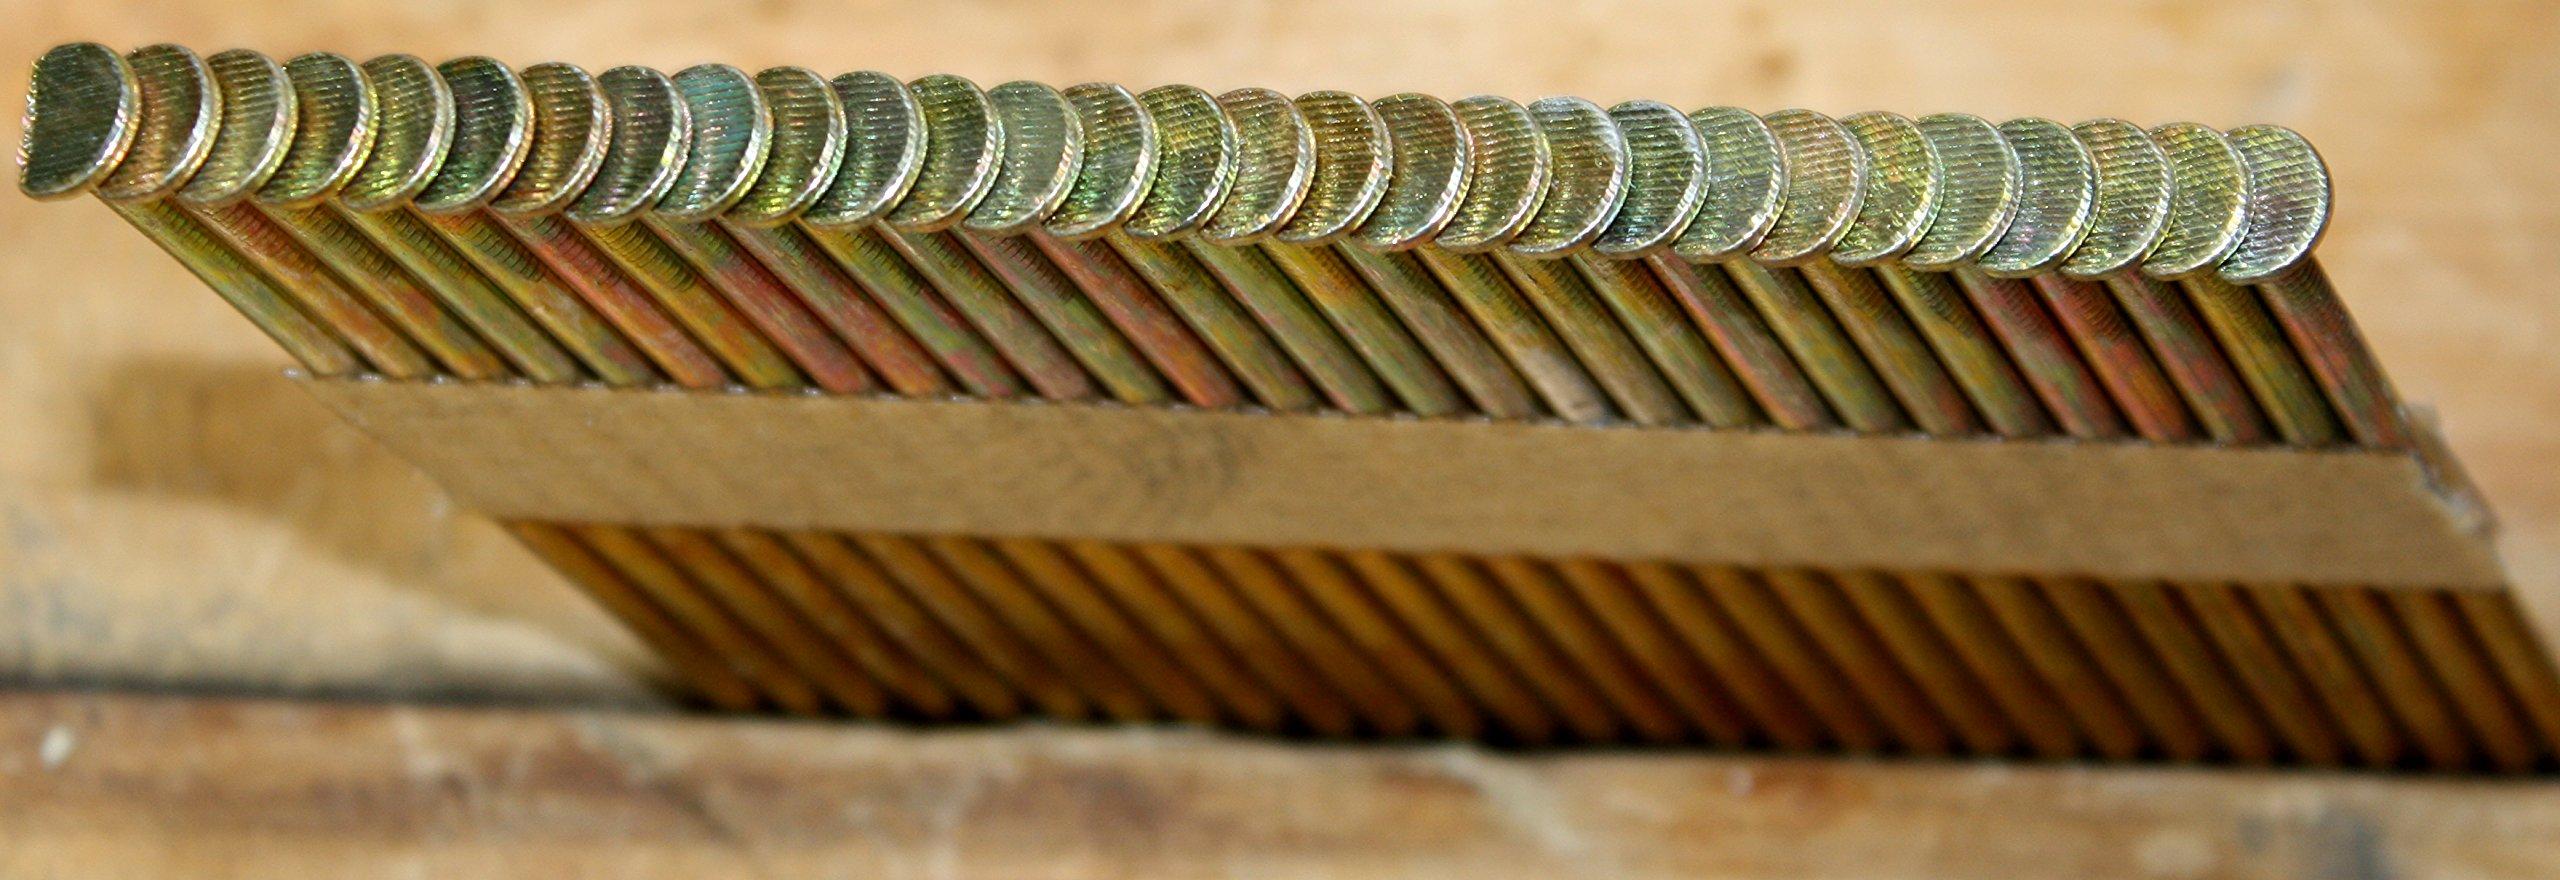 Ns289001 Framing Nailer Review Fine Homebuilding